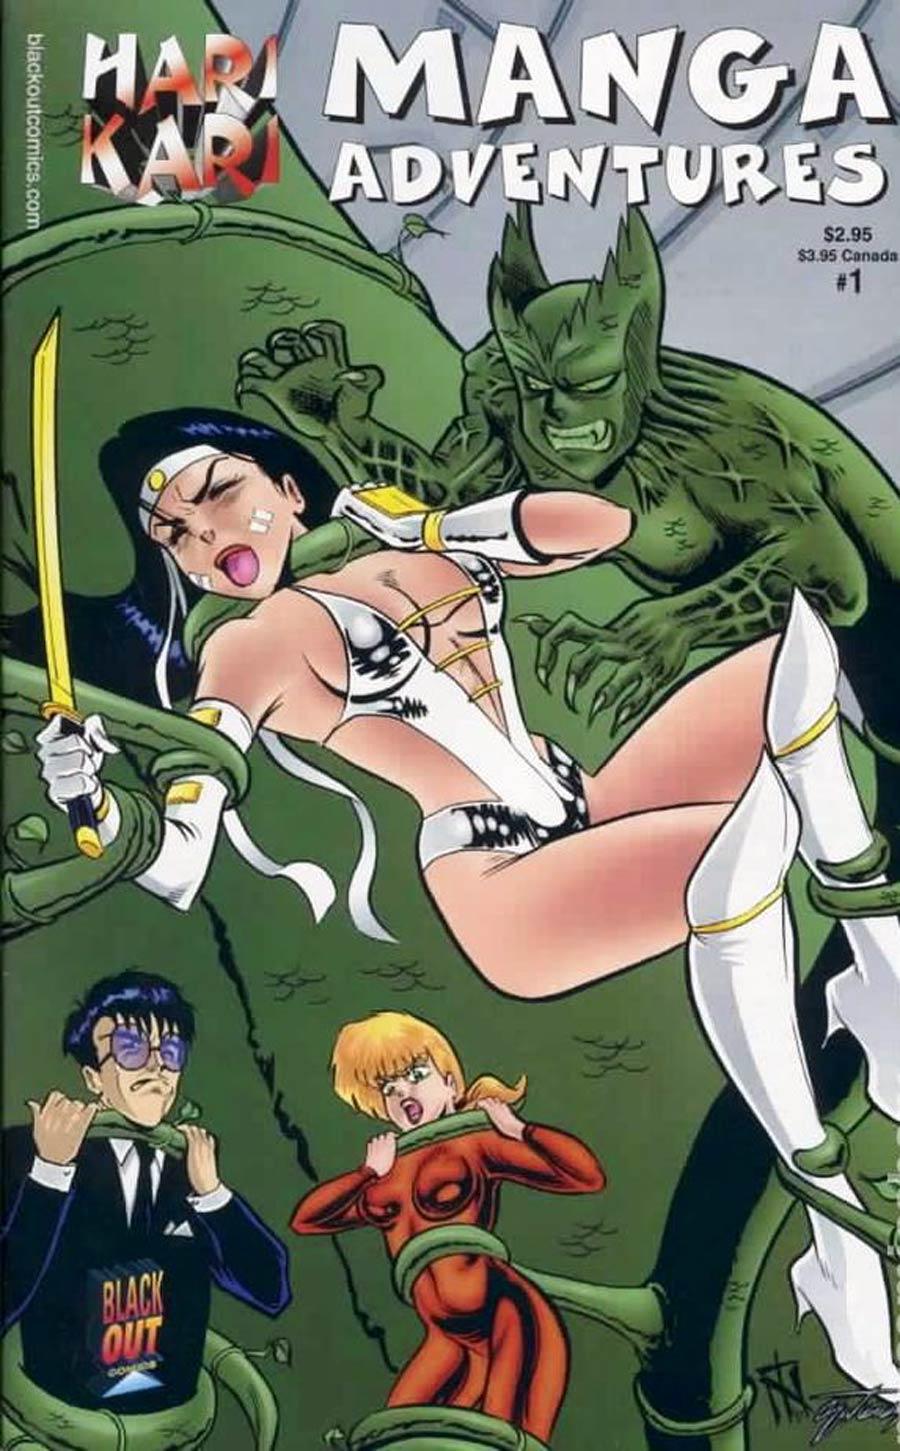 Hari Kari Manga Adventures #1